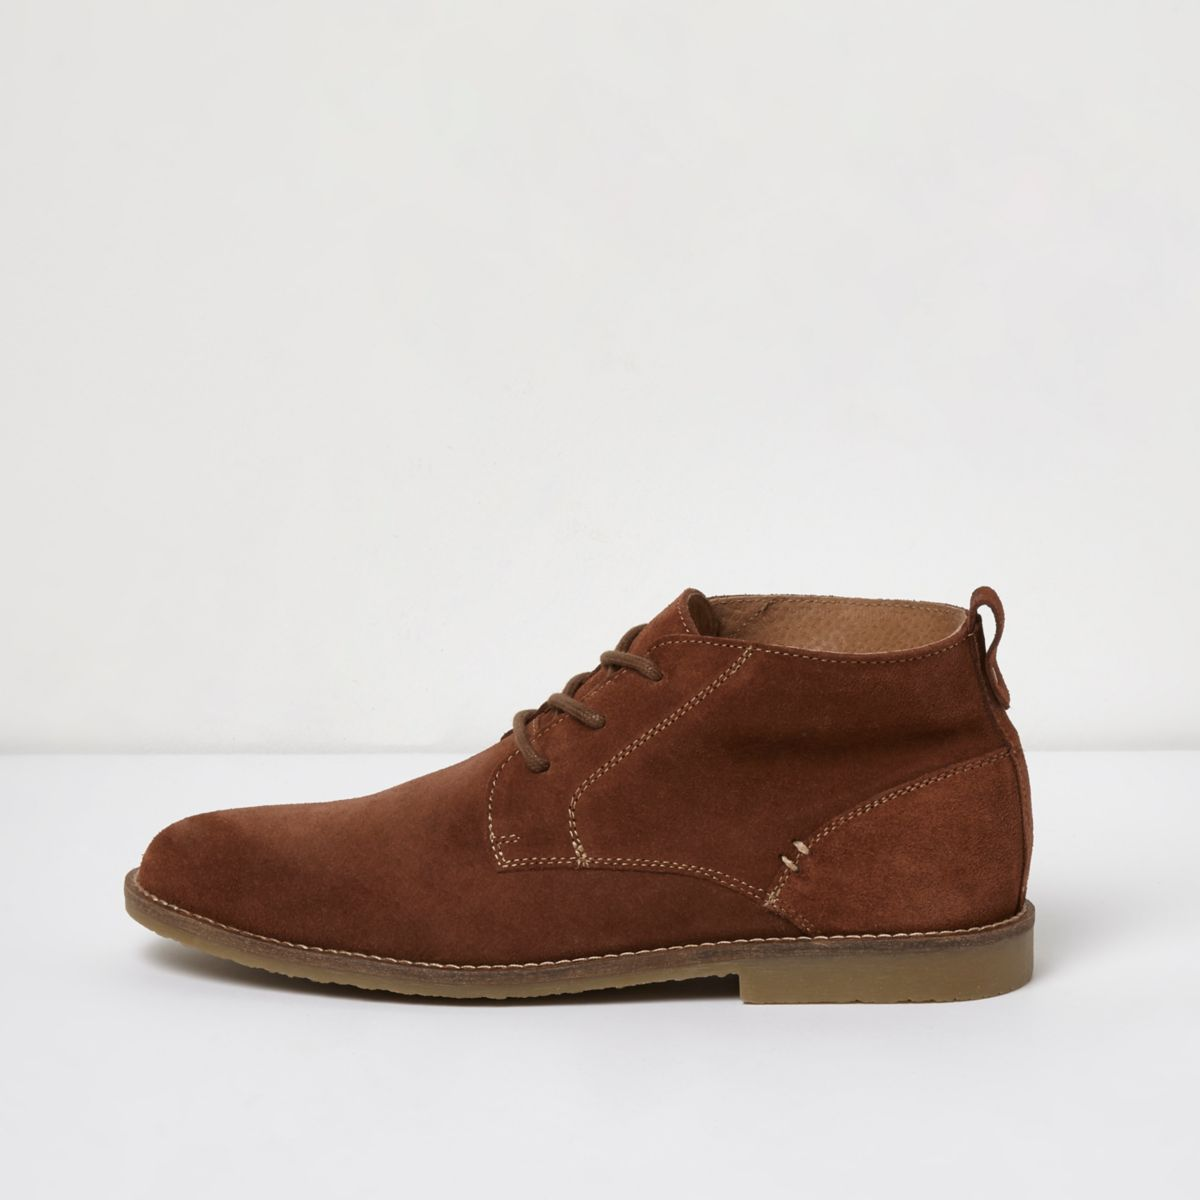 Tan brown suede desert boots